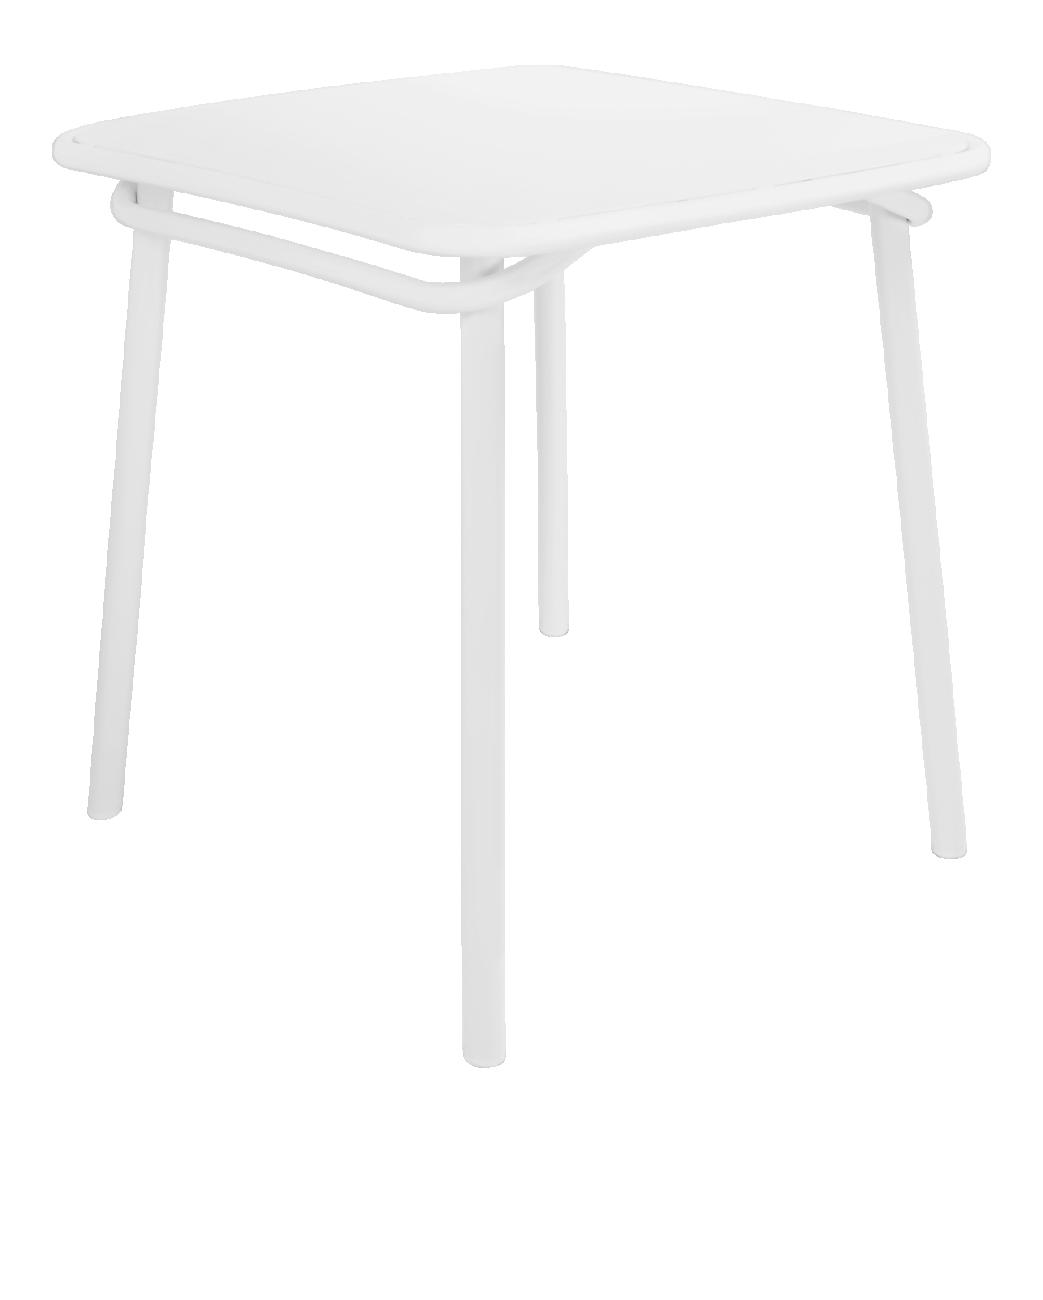 tables de jardins heva x x cm. Black Bedroom Furniture Sets. Home Design Ideas